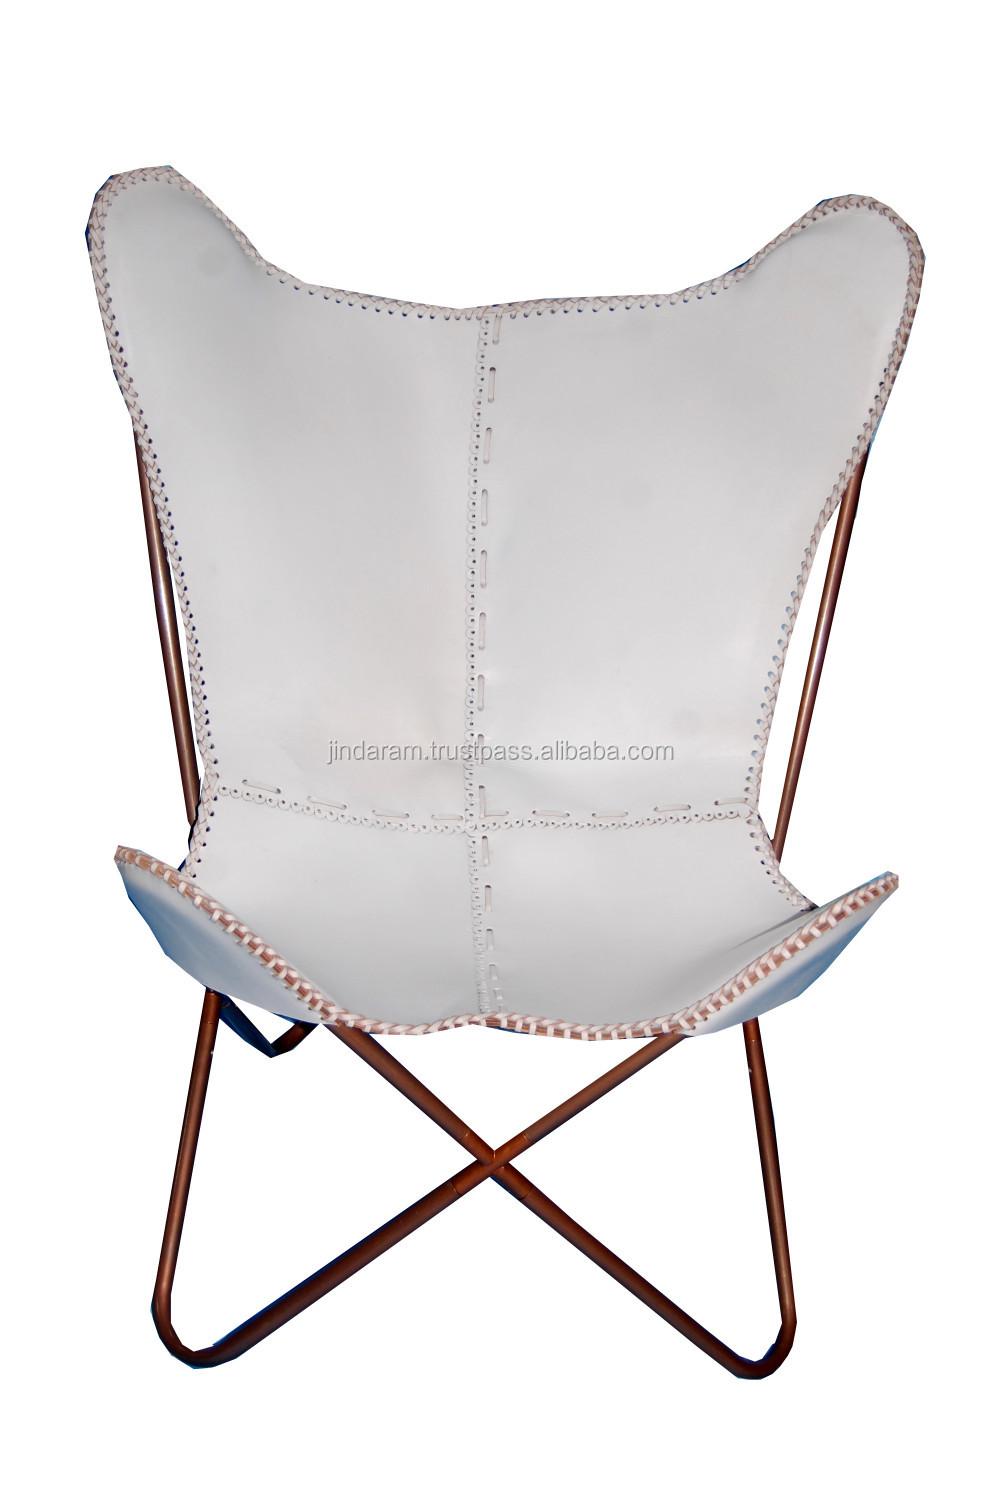 Super Scandinavian White Leather Butterfly Chair Buy Scandinavian White Leather Butterfly Chair Royal White Butterfly Chair Royal White Leather Chair Theyellowbook Wood Chair Design Ideas Theyellowbookinfo